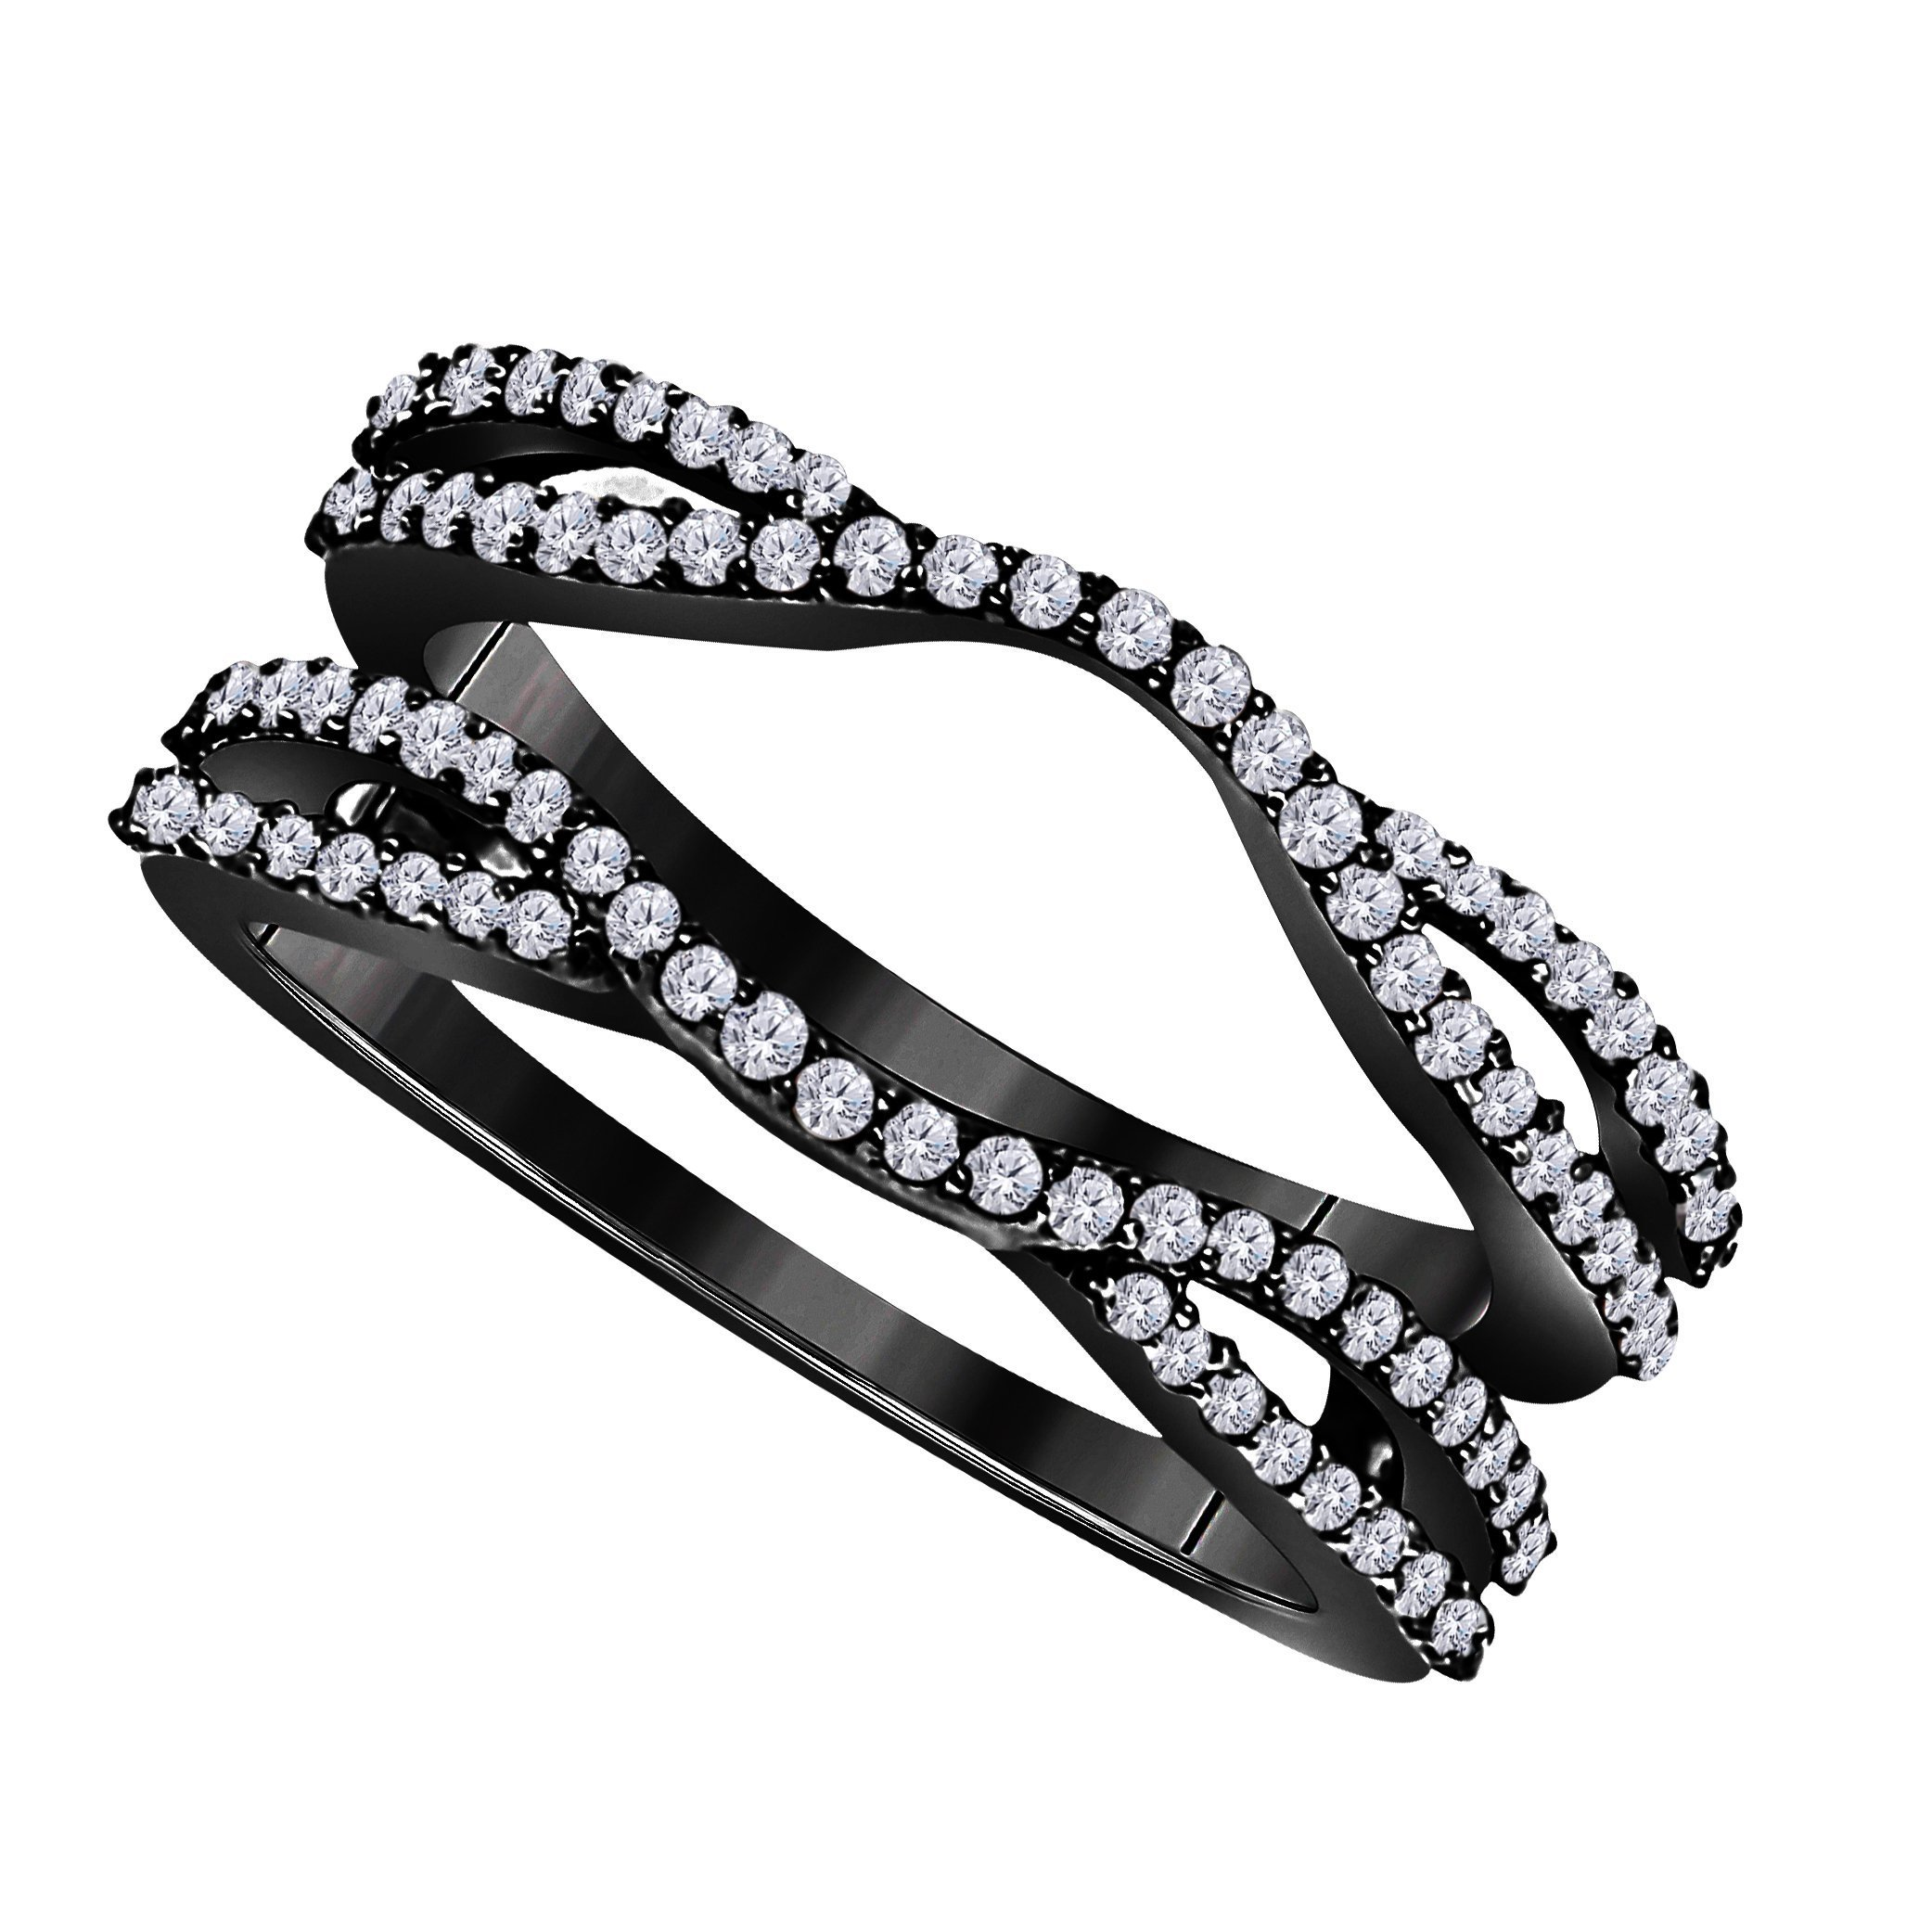 Star Retail 1/2 Ct Black Rhodium Finish Round Cut Cubic Zirconia Ladies Anniversary Wedding Band Enhancer Guard Double Chevron Ring